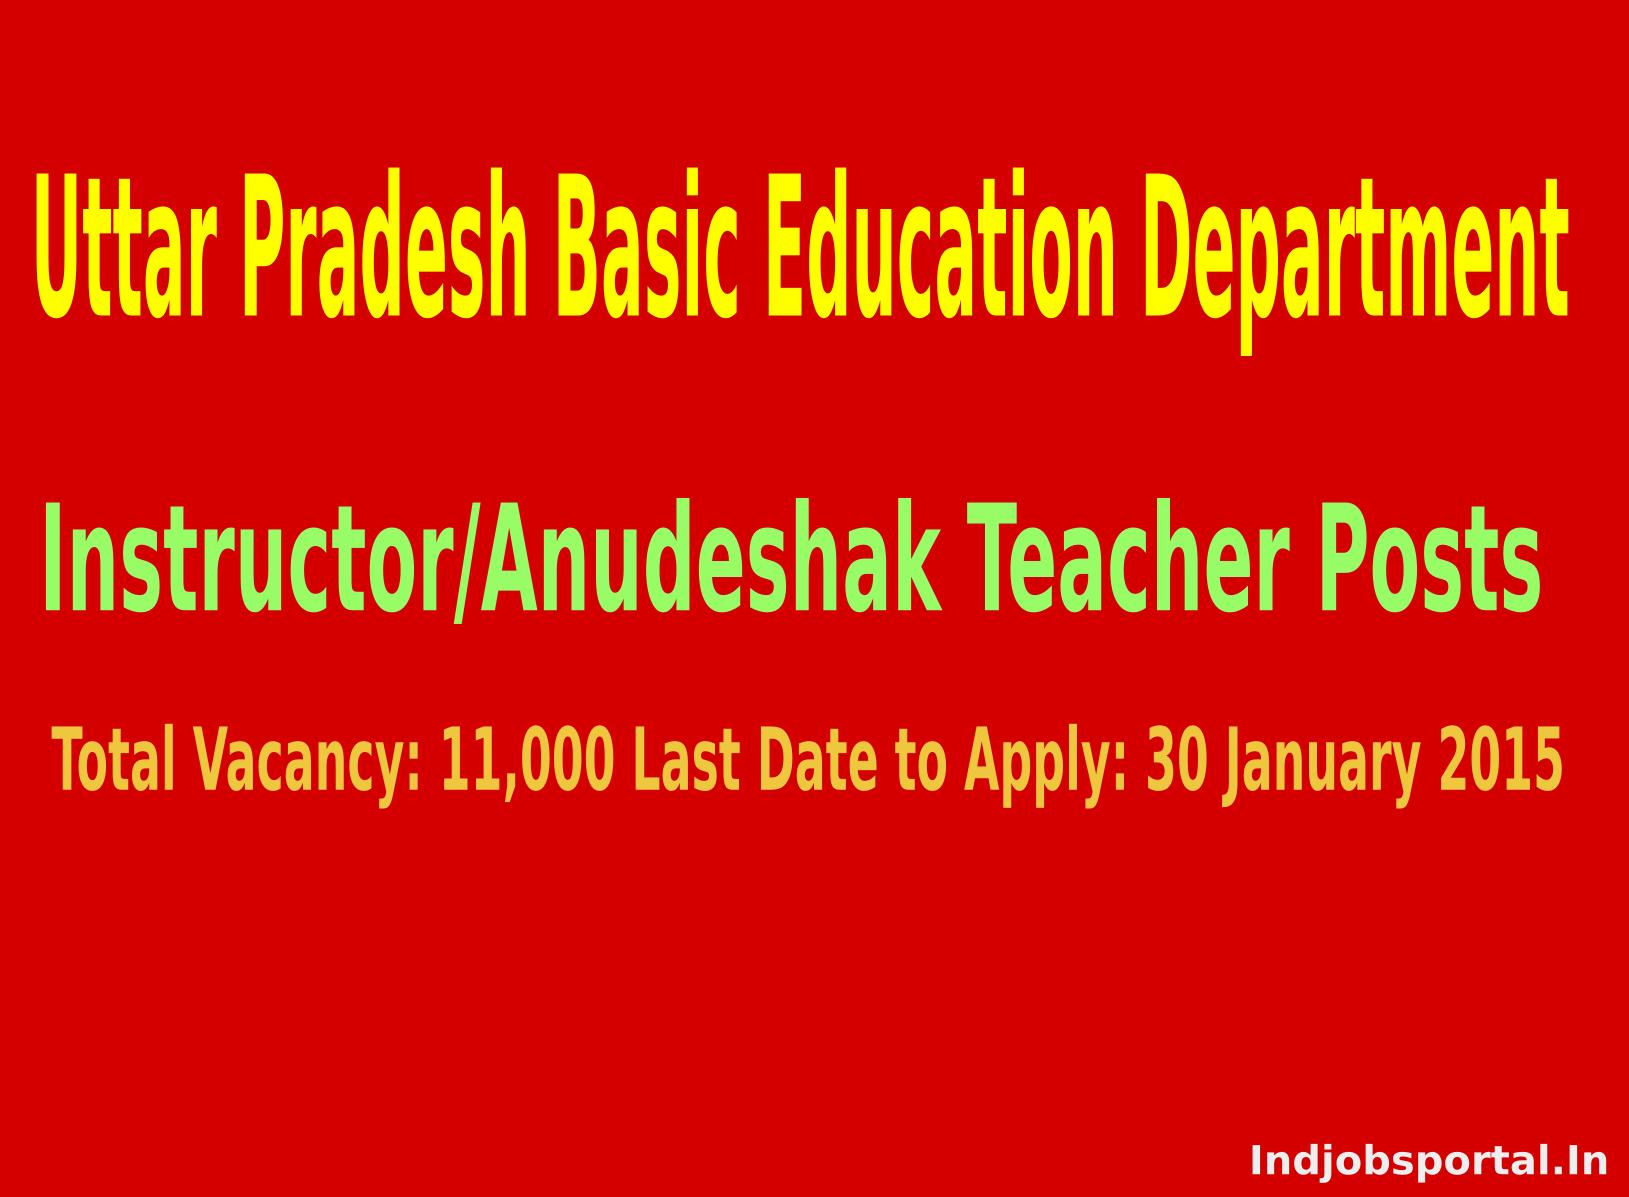 UP Basic Education Department Recruitment 2015 for 11000 InstructorAnudeshak Teacher Posts